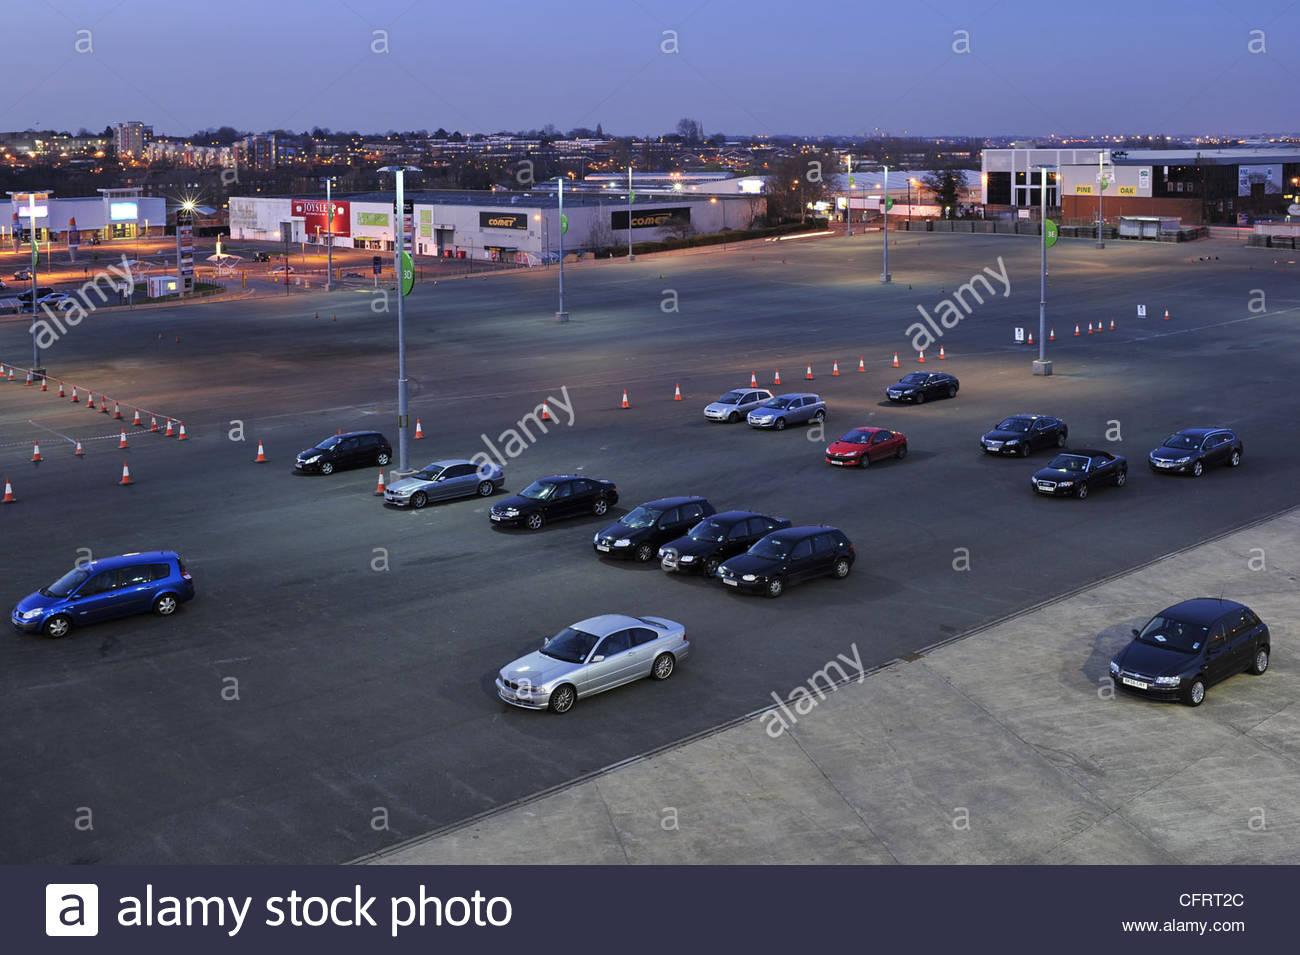 Wembley car and retail park at dusk, London UK - Stock Image